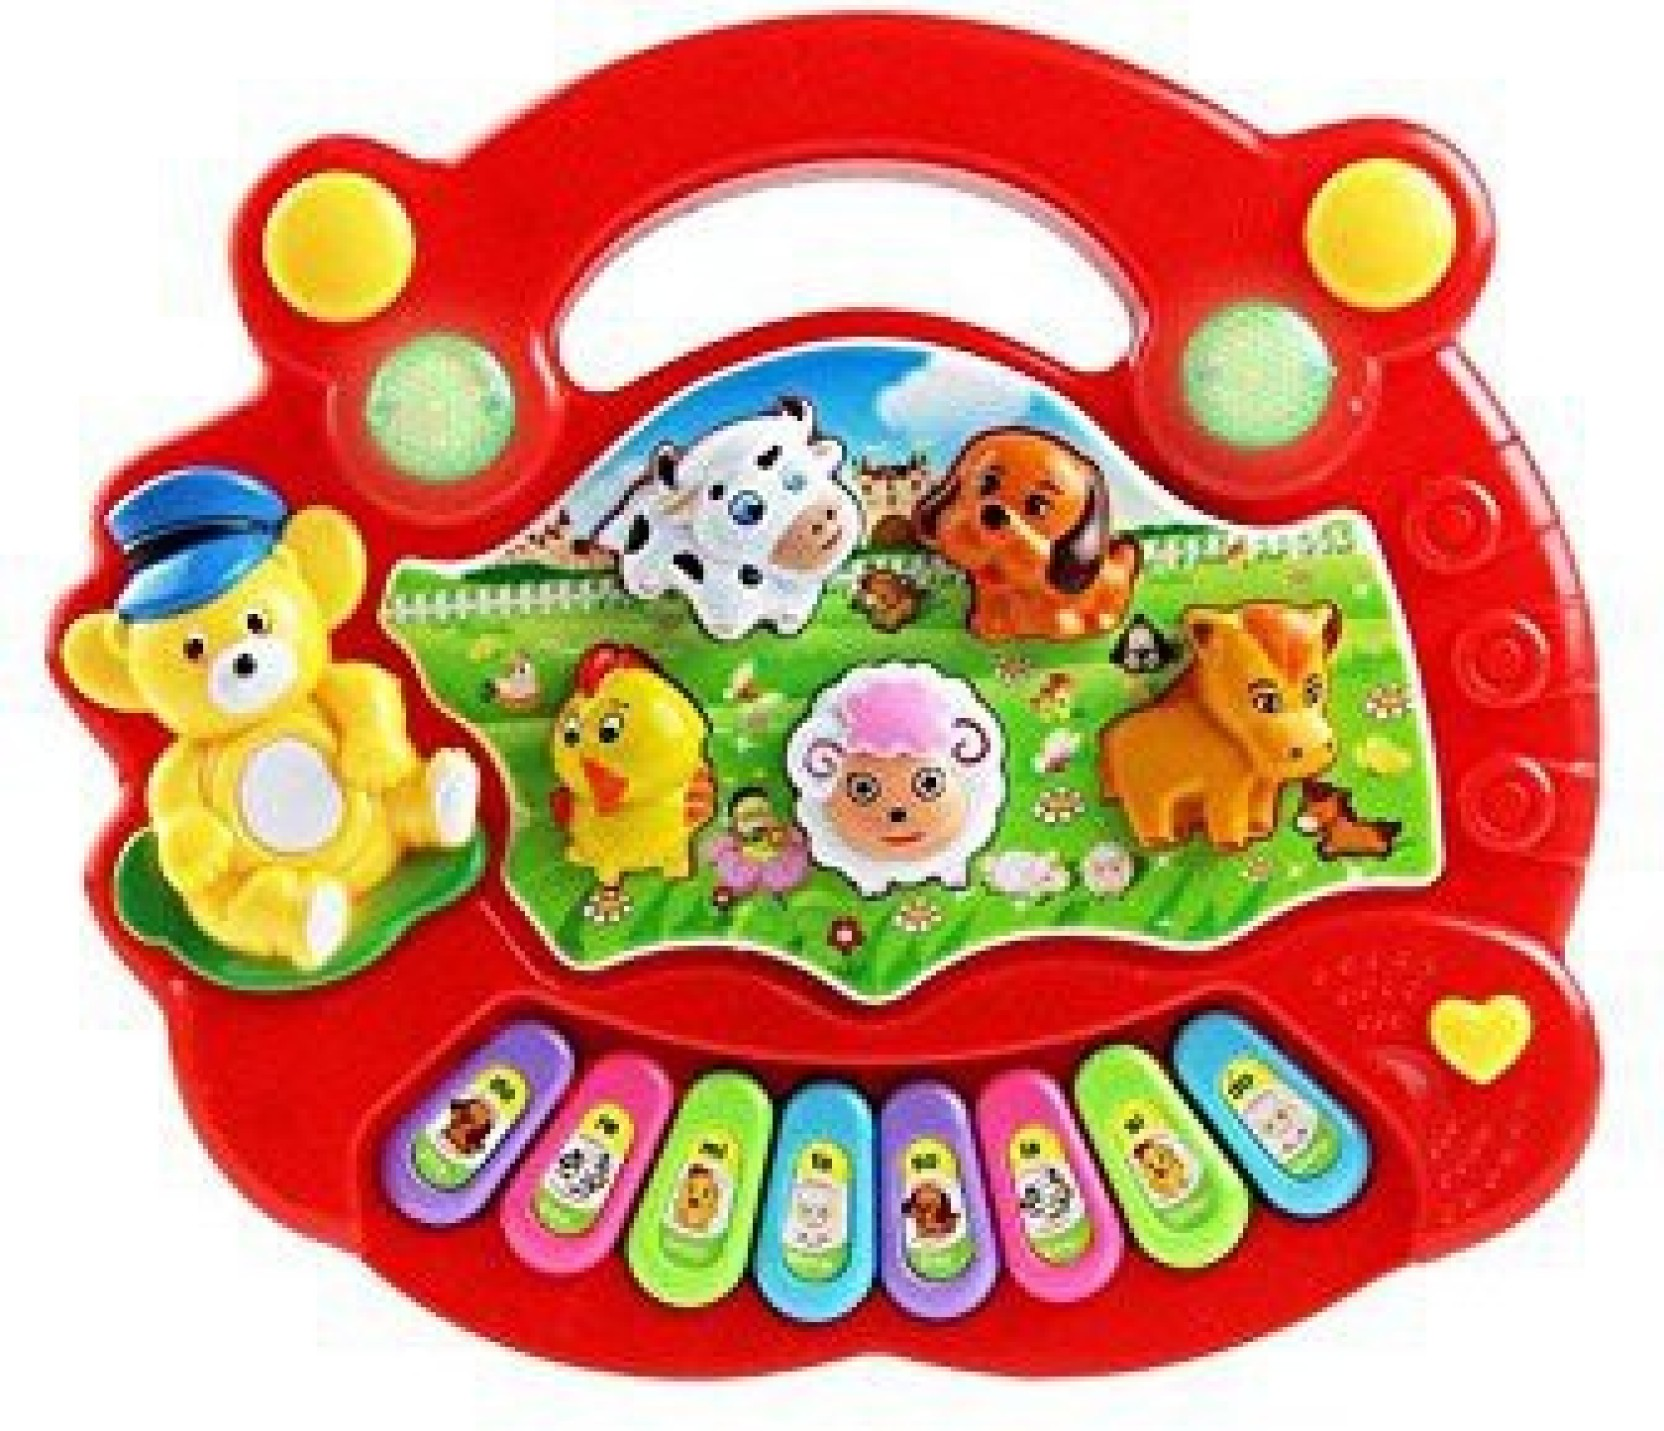 Generic Pawaca Keyboard Piano Toy Toddler Musical Instrument Enjoy Farm Music Playmat Share